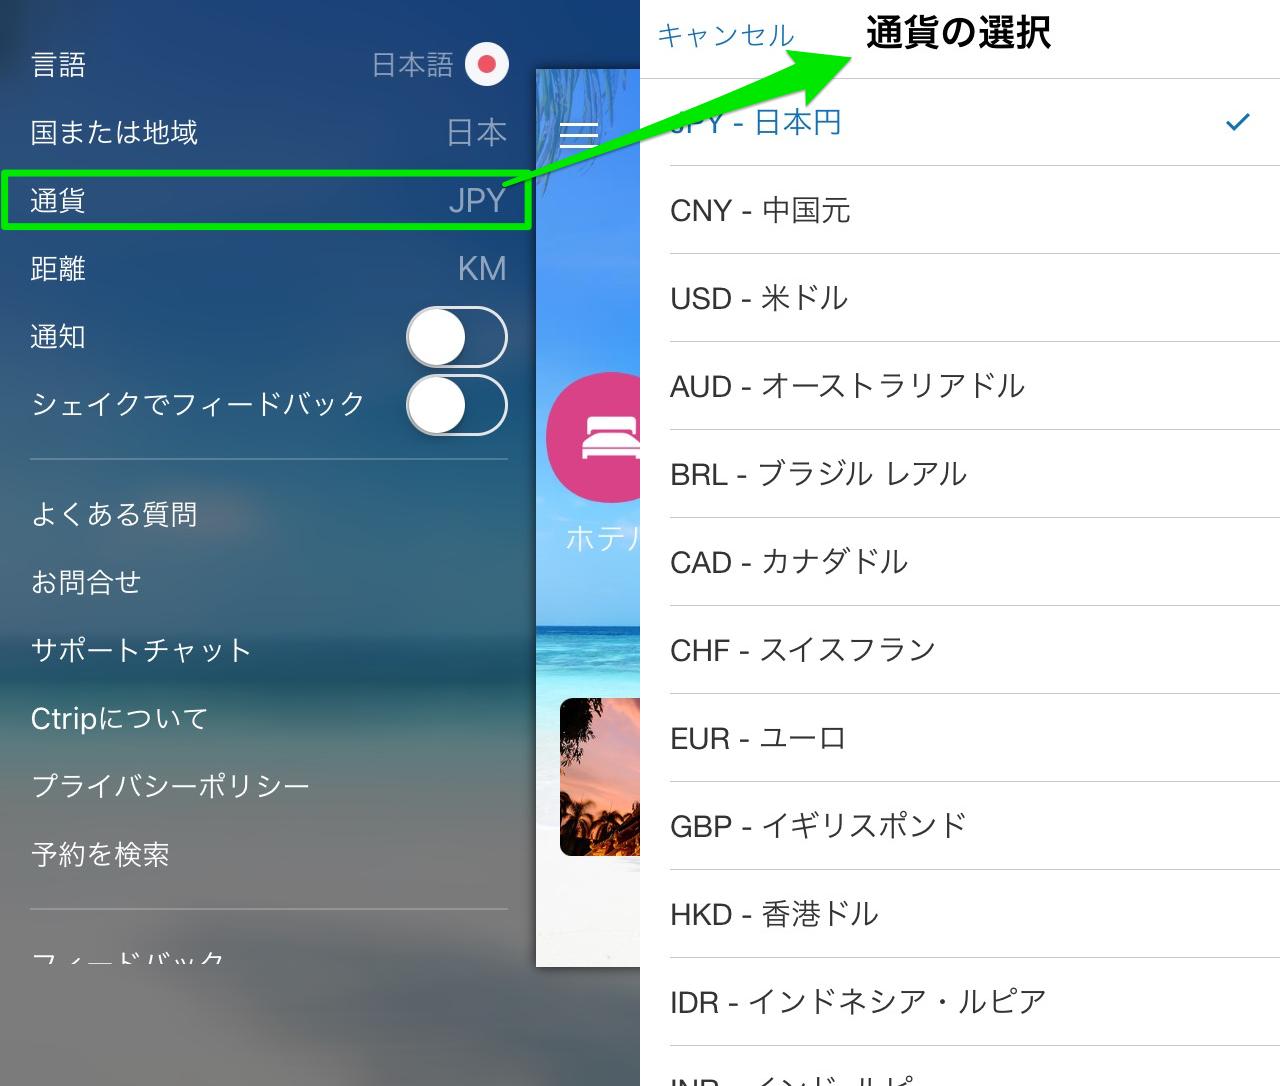 Ctripアプリで通貨表示変更可能